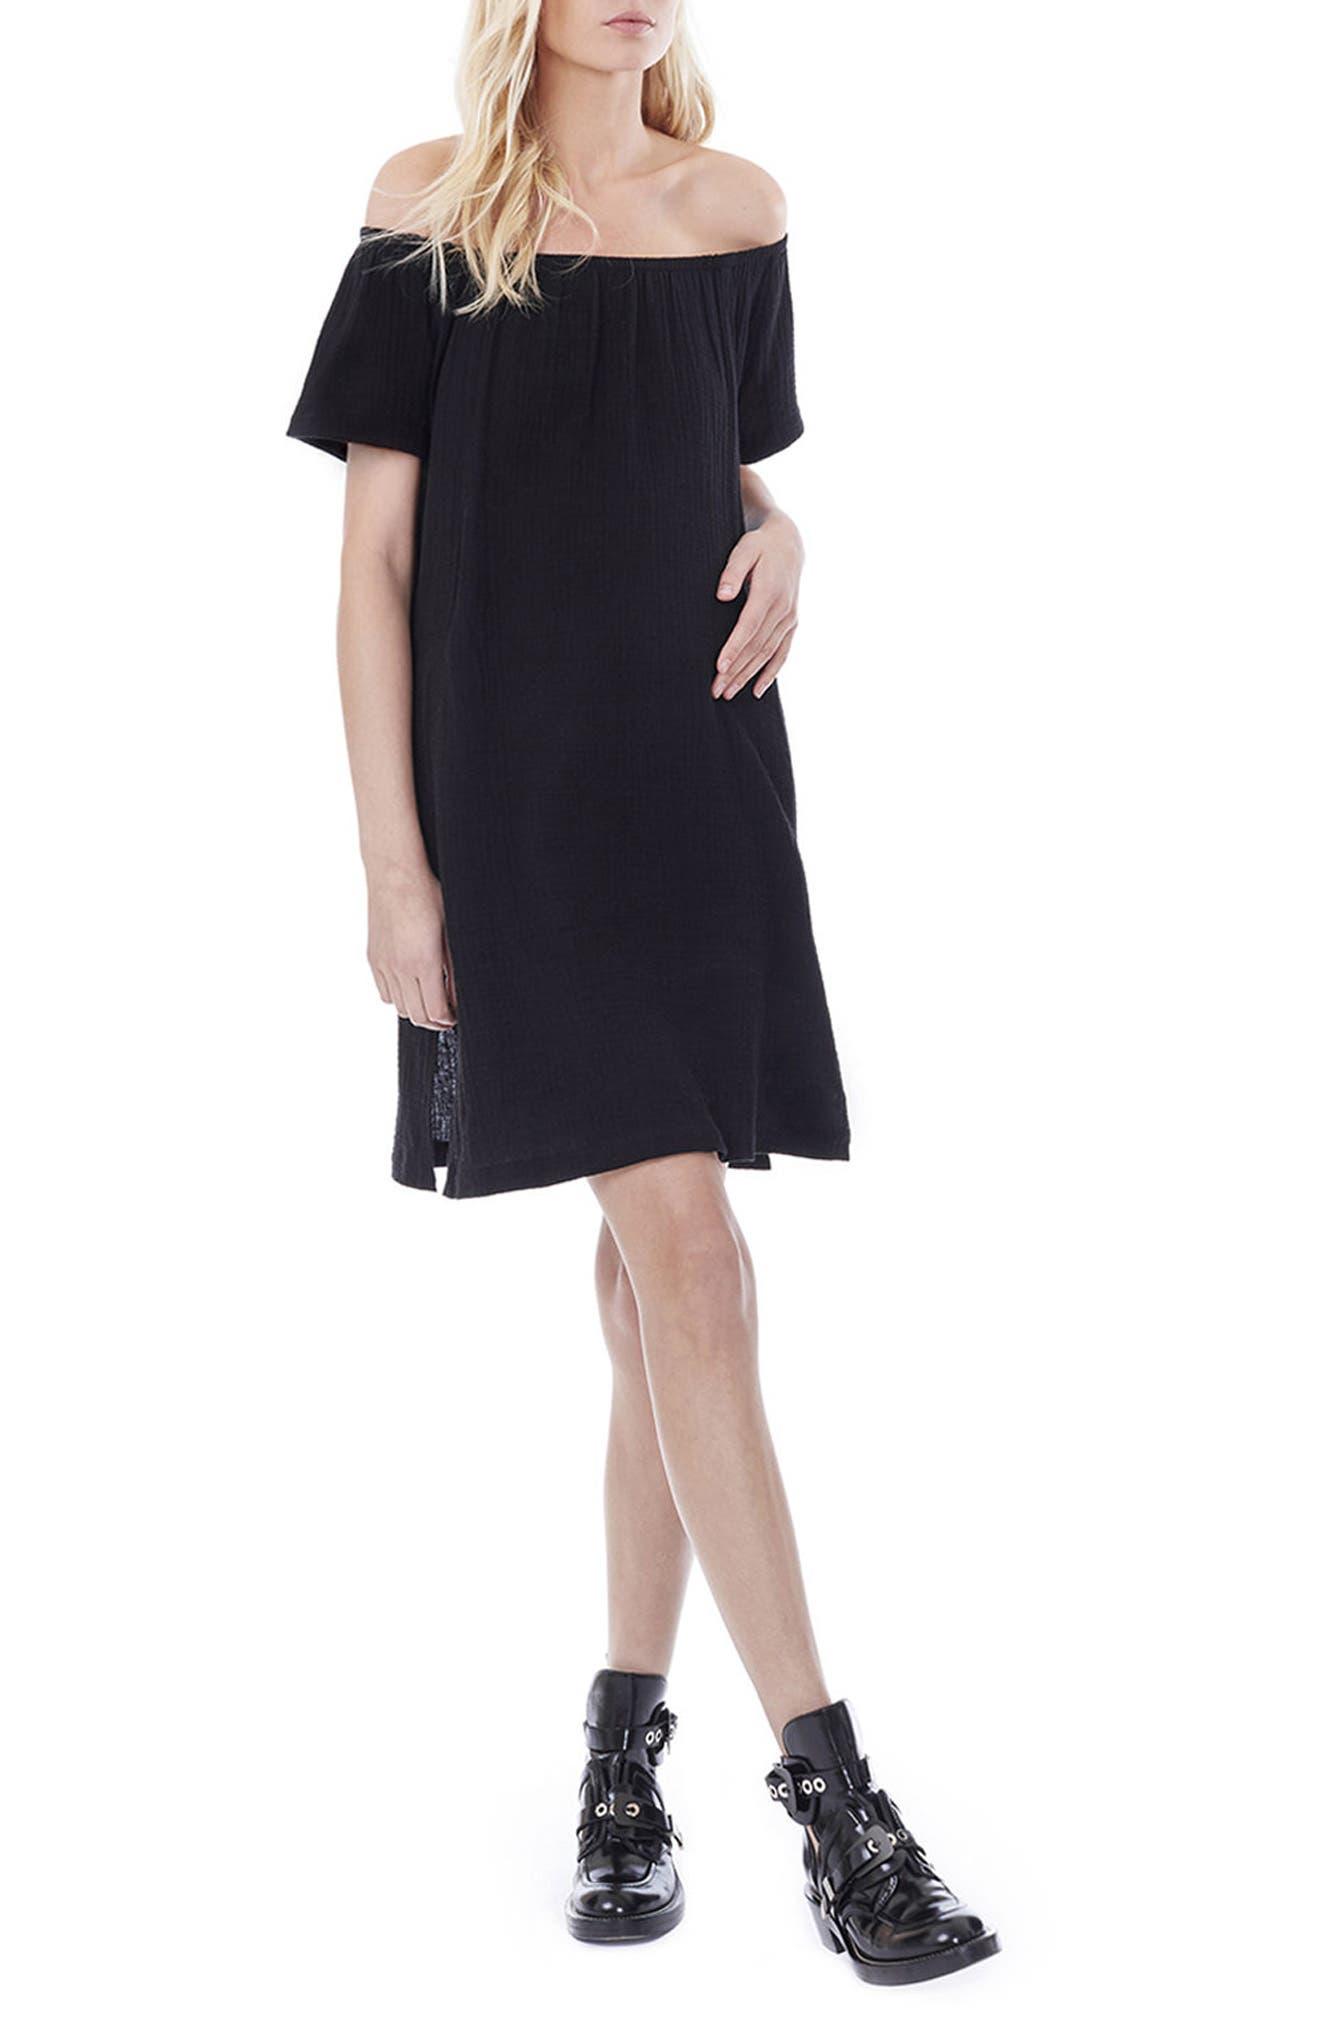 Main Image - Loyal Hana Ariel Off The Shoulder Maternity/Nursing Dress